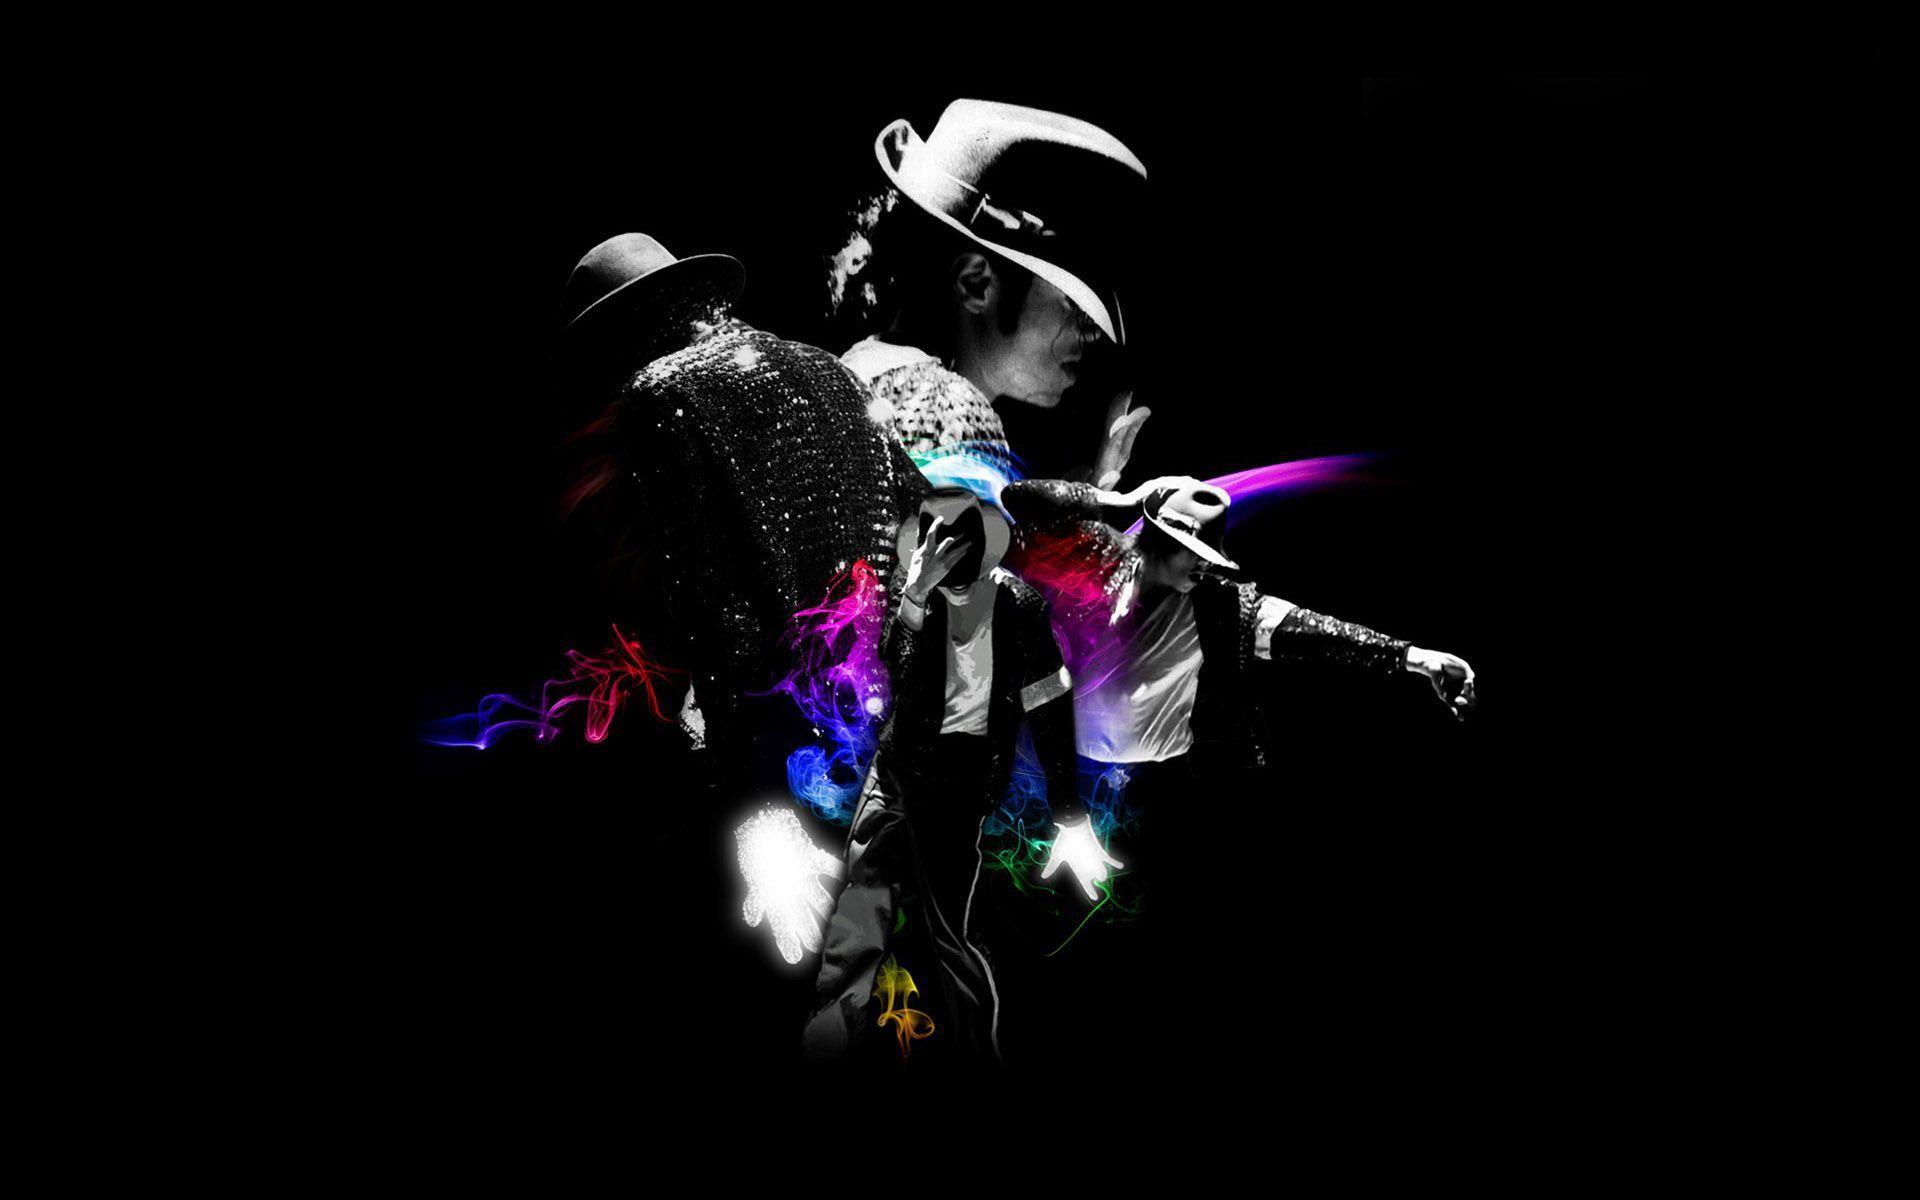 Michael Jackson 3d Wallpapers Top Free Michael Jackson 3d